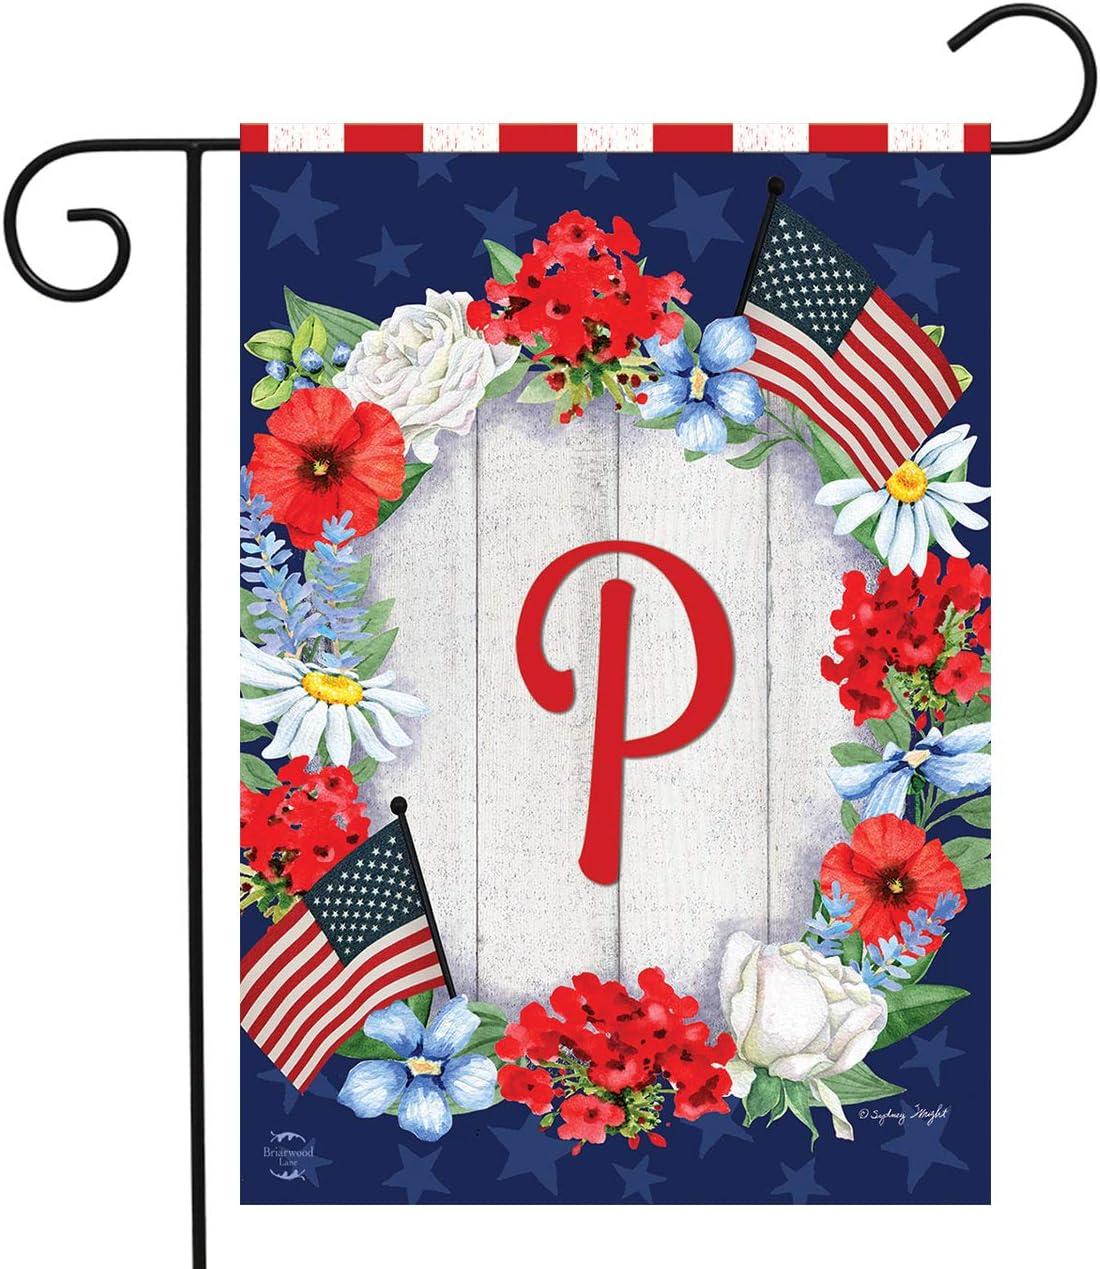 "Briarwood Lane Patriotic Monogram Letter P Garden Flag Floral Wreath 12.5"" x 18"""